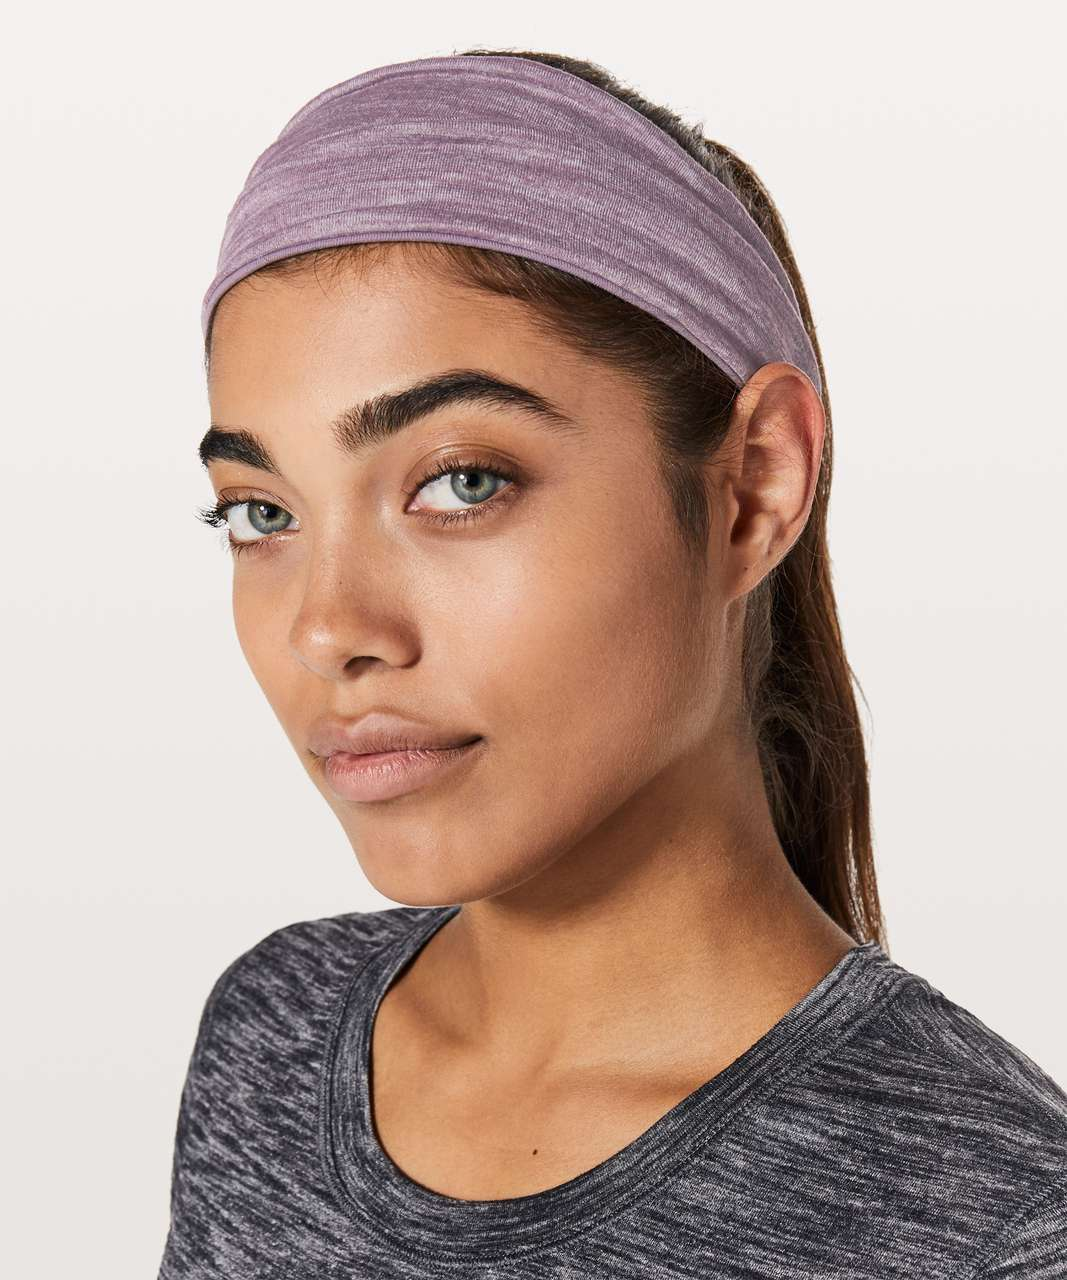 Lululemon Fringe Fighter Headband - Smoked Mulberry / Heathered Smoked Mulberry